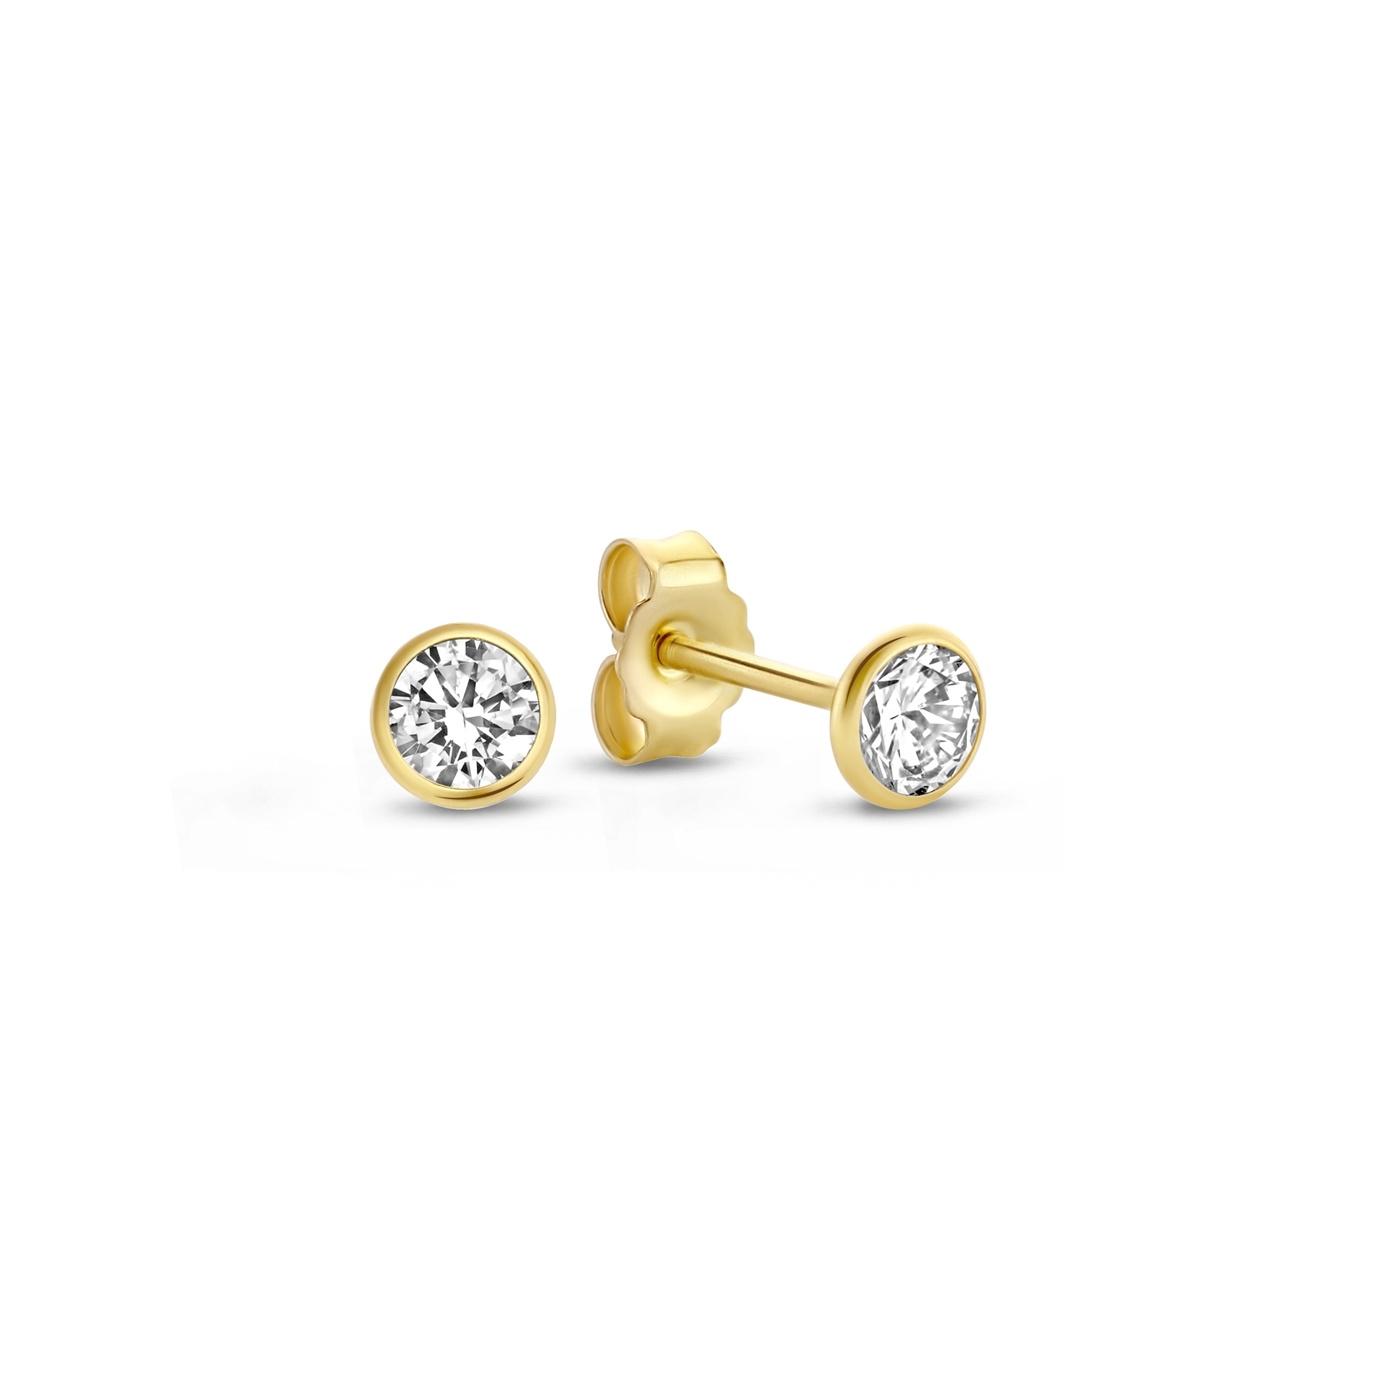 Isabel Bernard Rivoli Juliette clous d'oreilles en or 14 carats